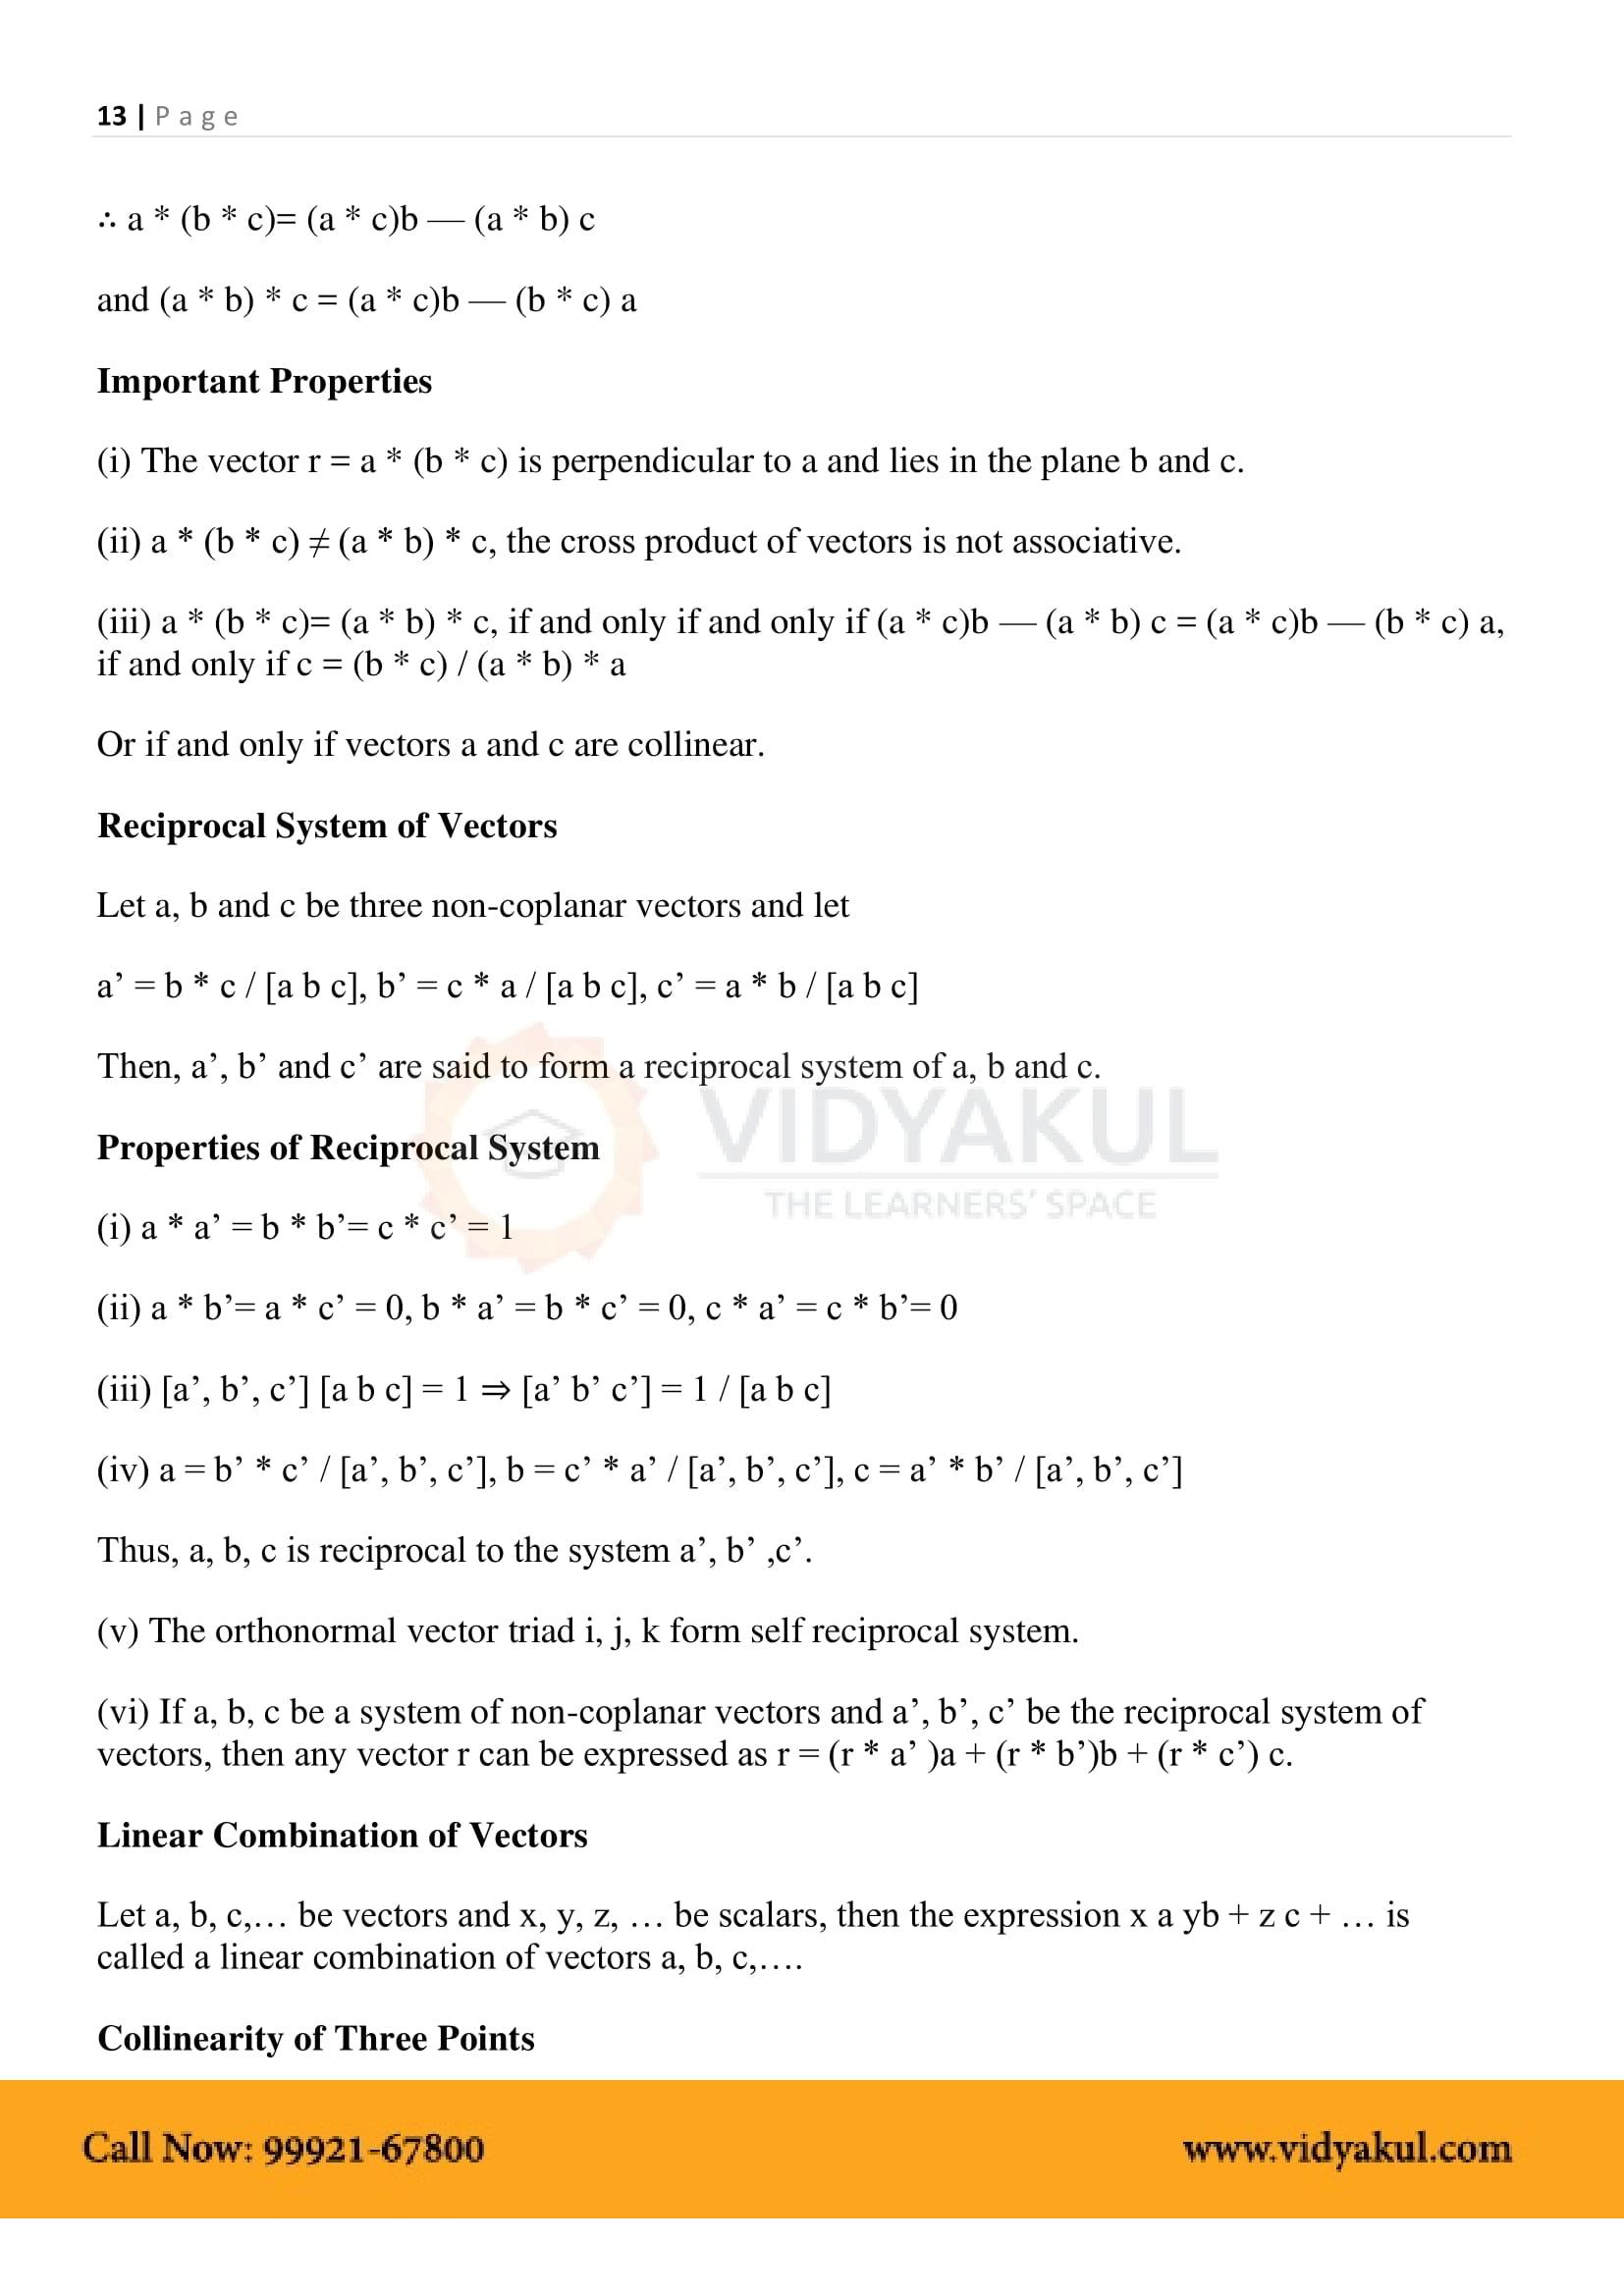 Vector Algebra Class 12 Formulas Pdf With Notes Vidyakul